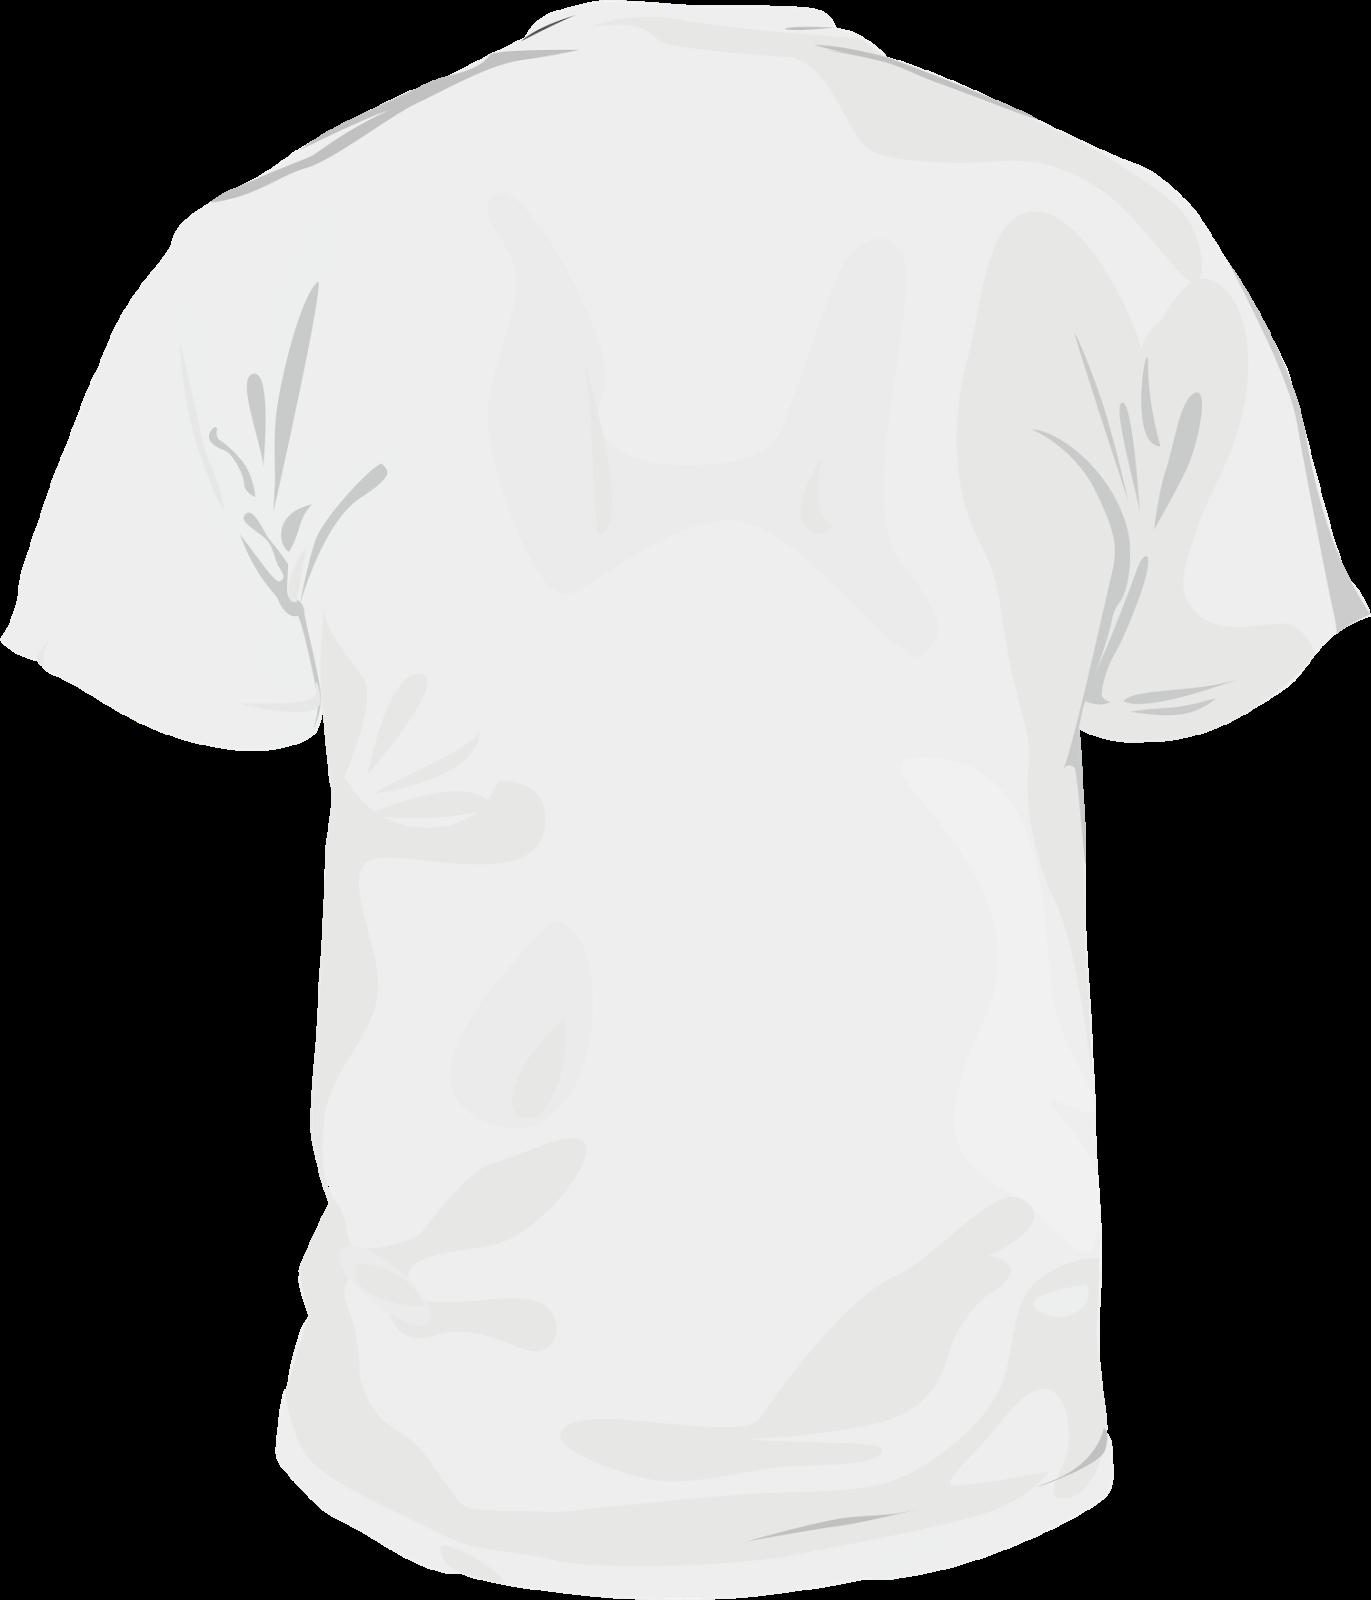 white t shirt template back joy studio design gallery